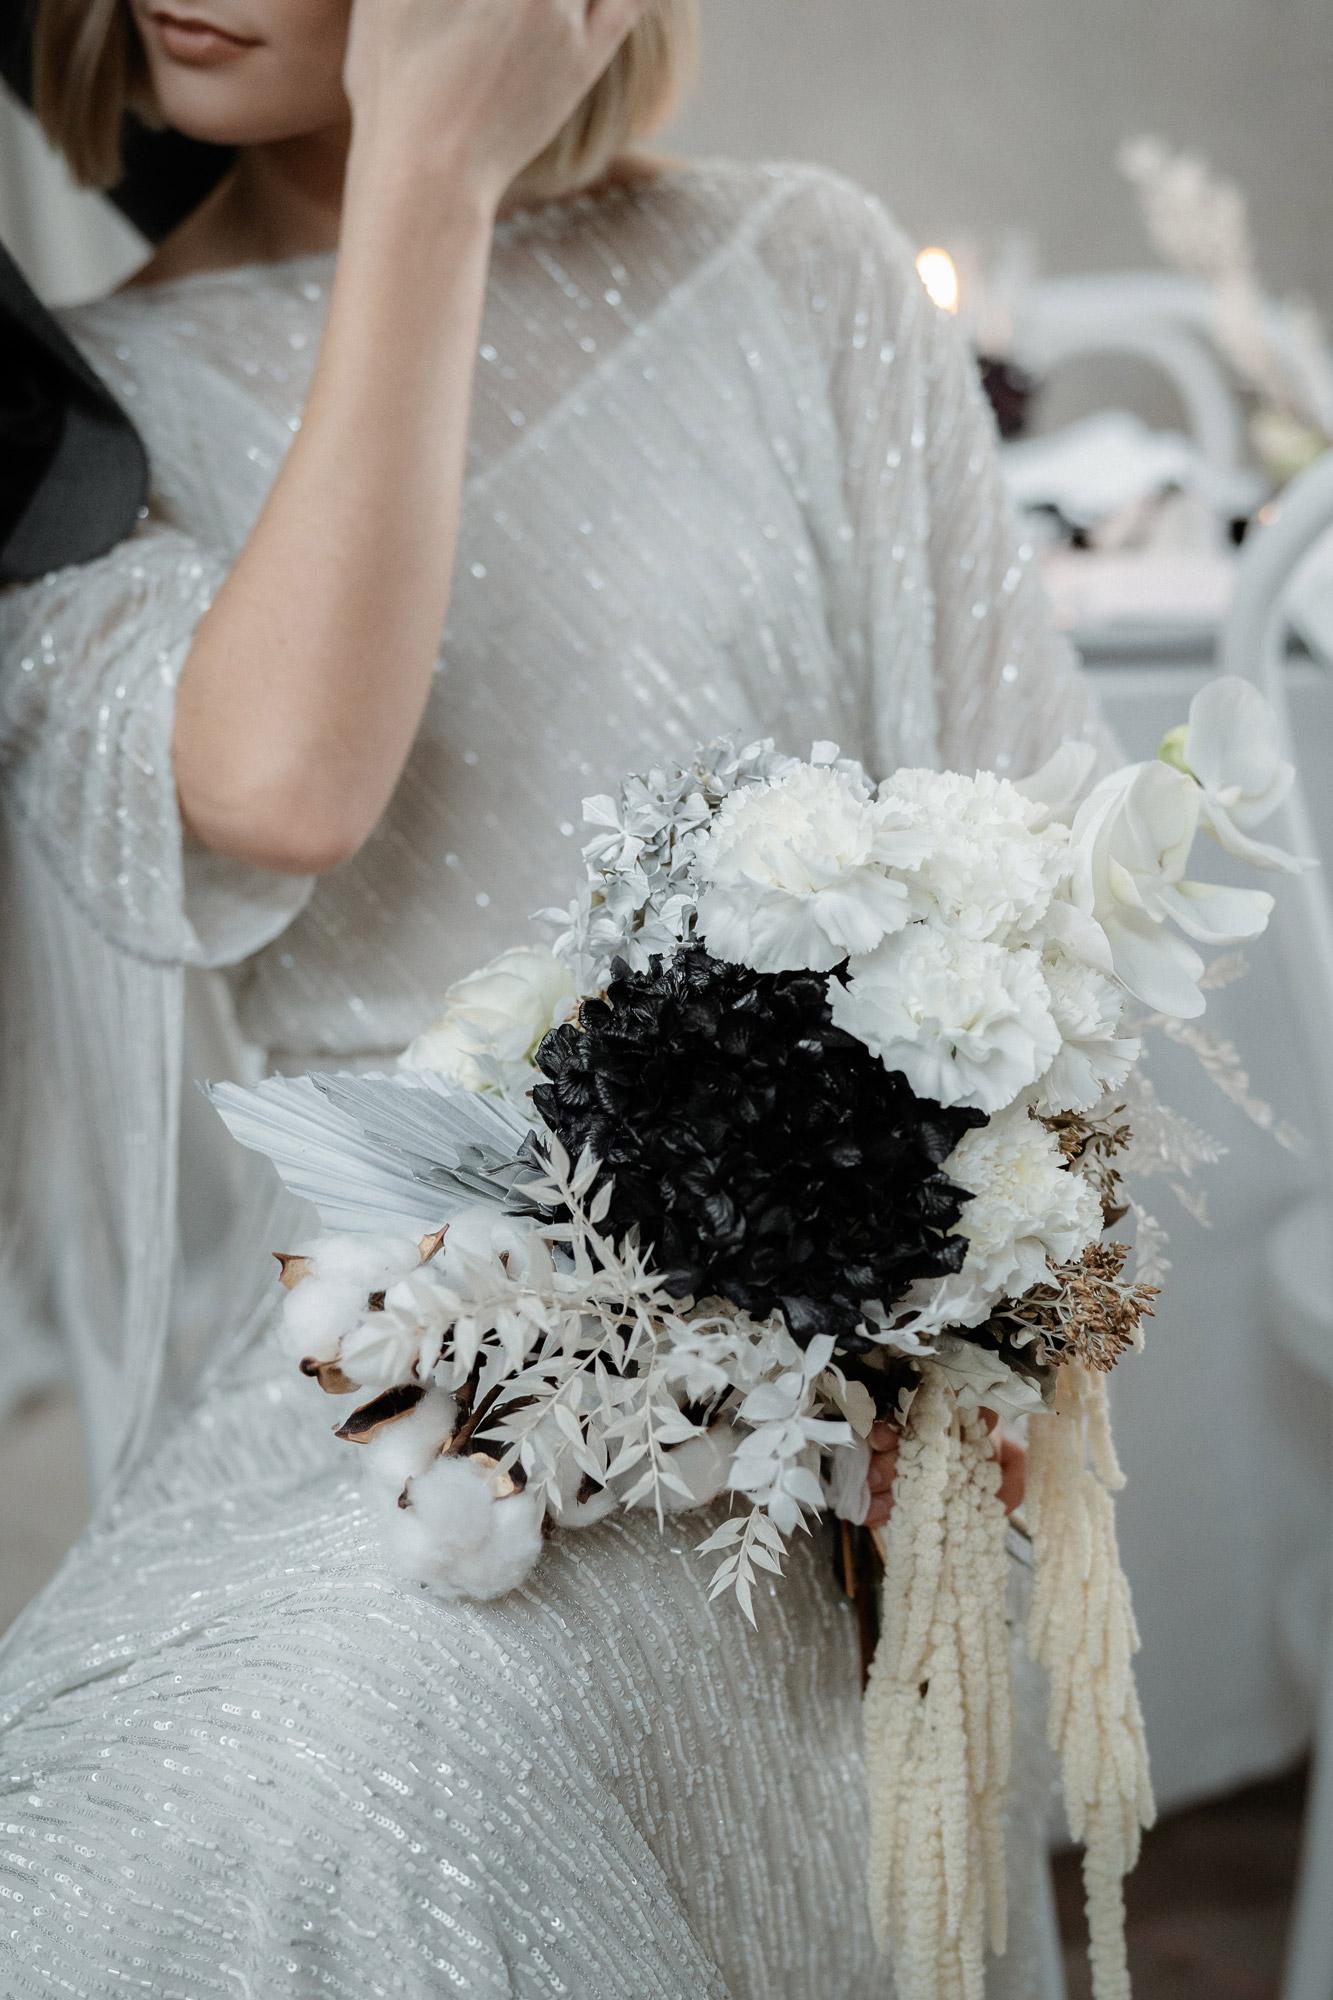 Auckland wedding photographer and wedding videographer